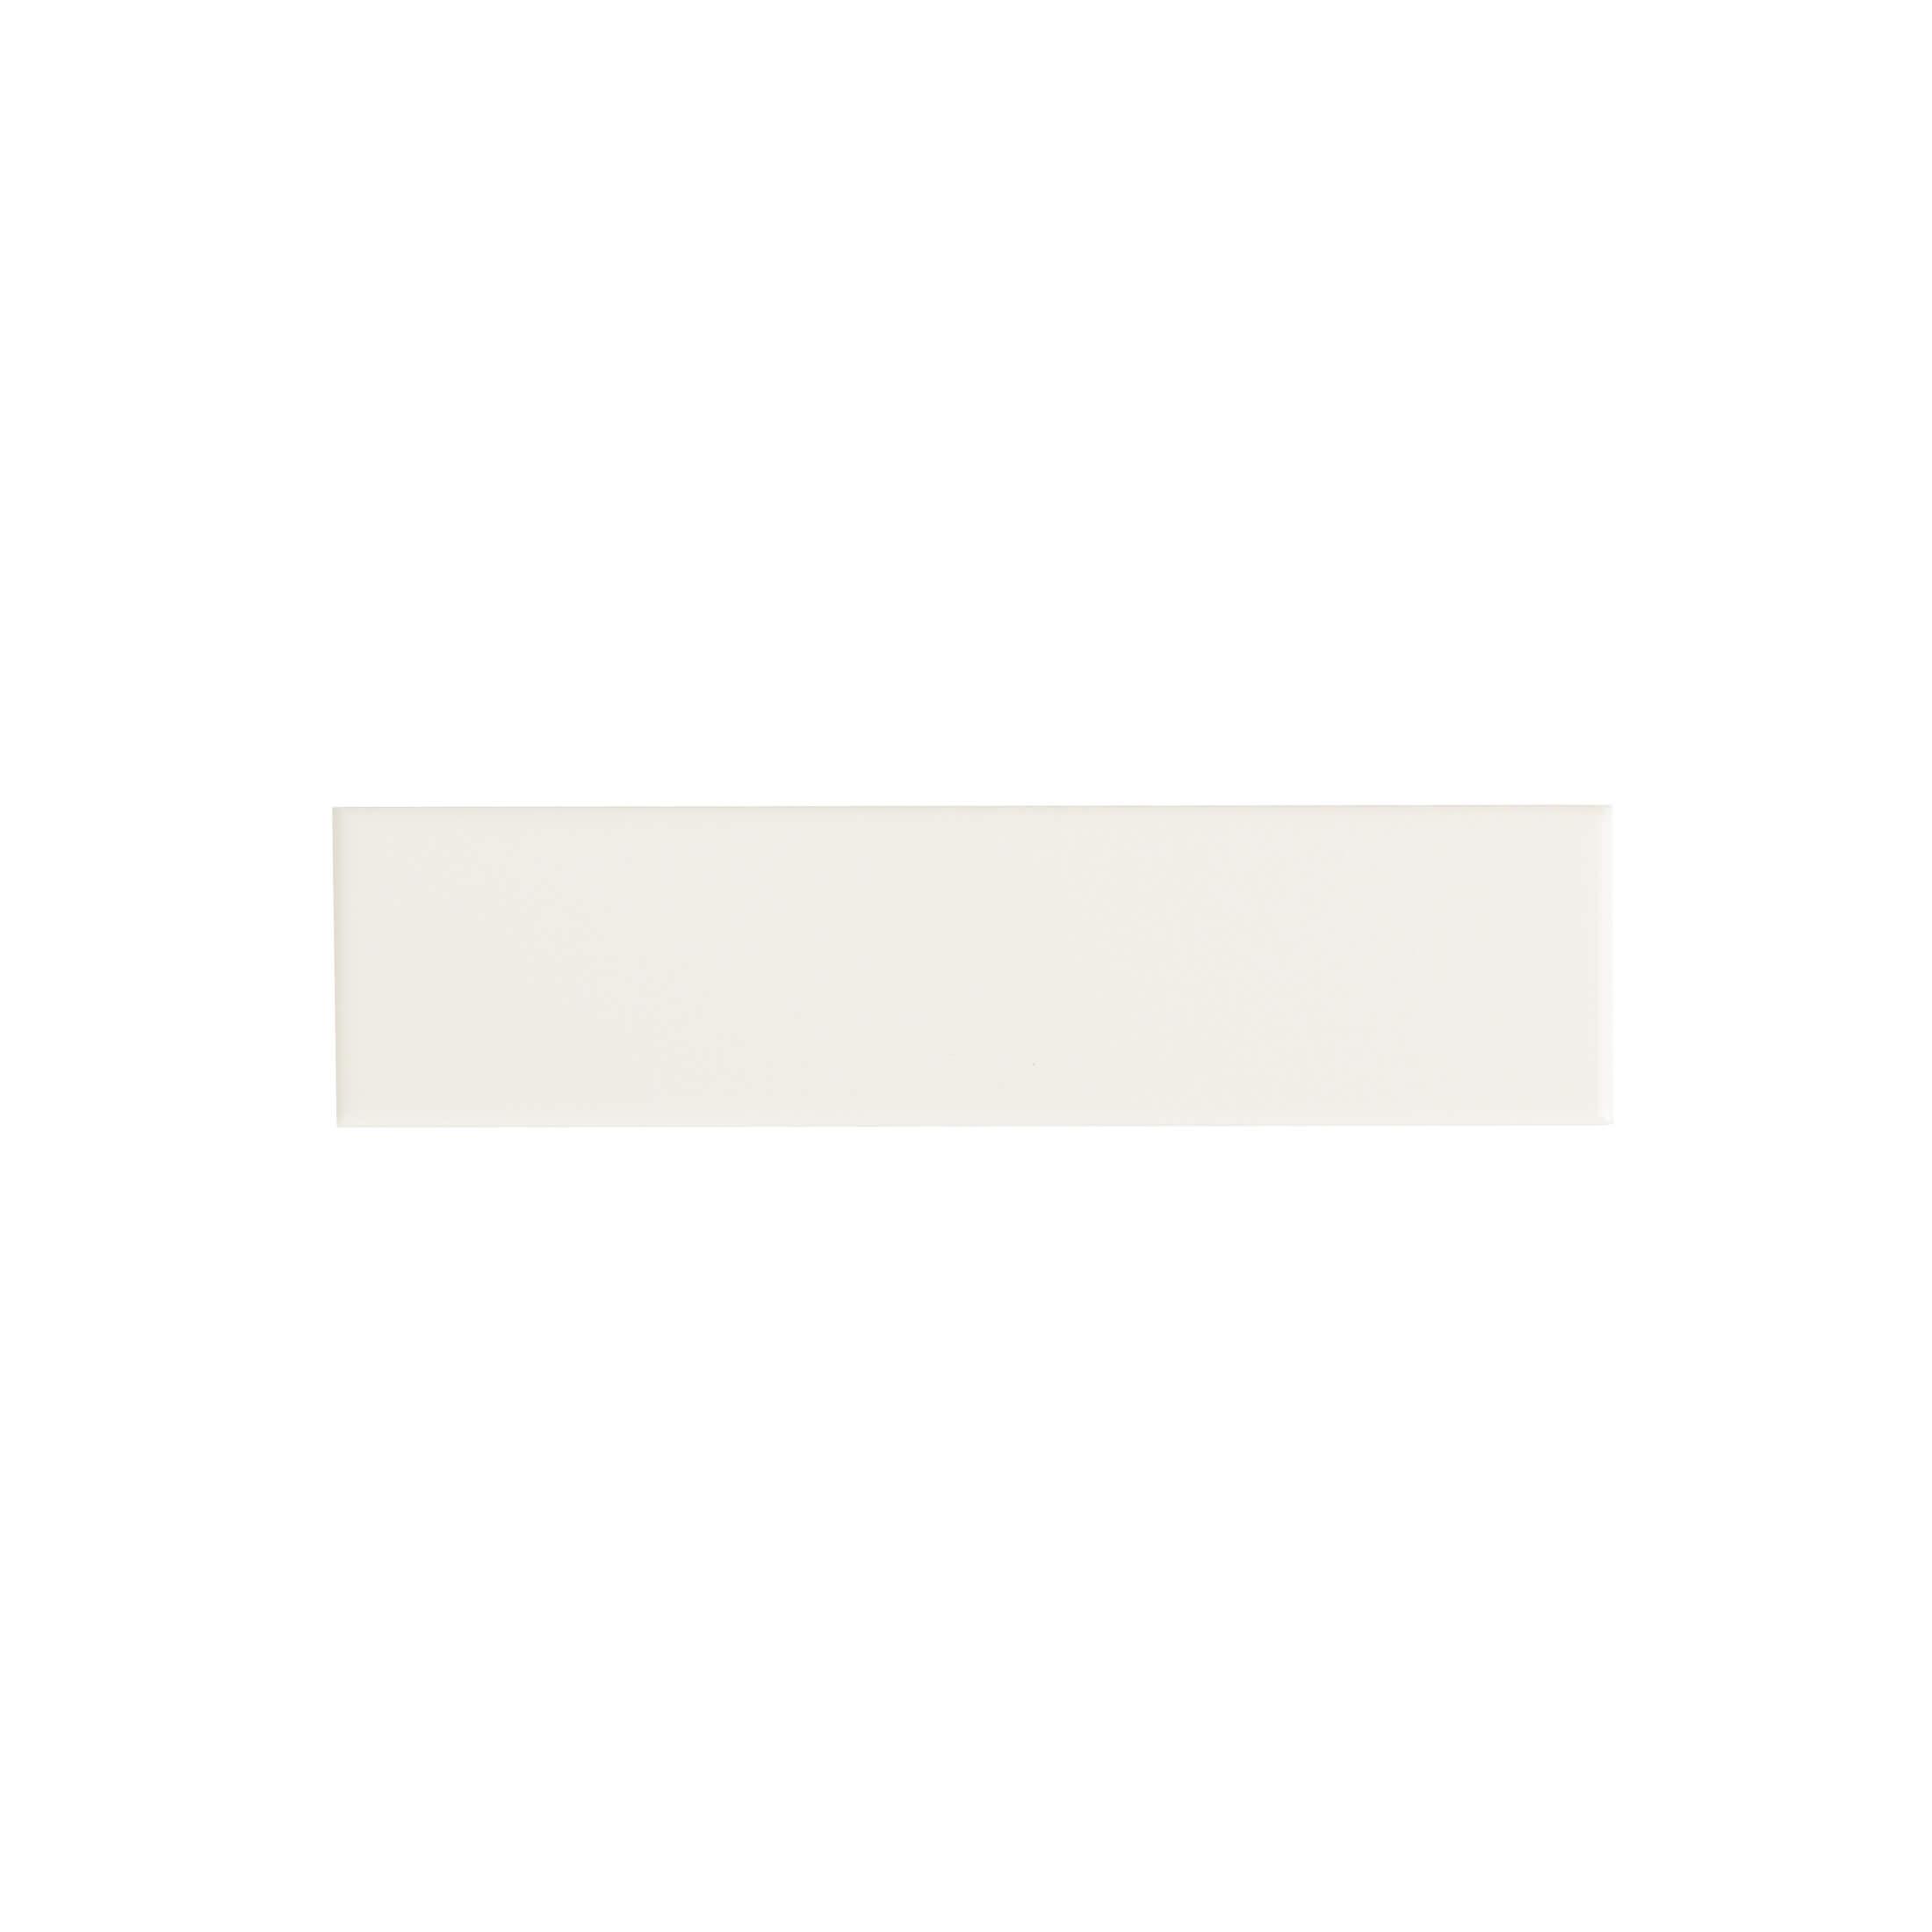 ADNE1057 - LISO PB - 5 cm X 20 cm